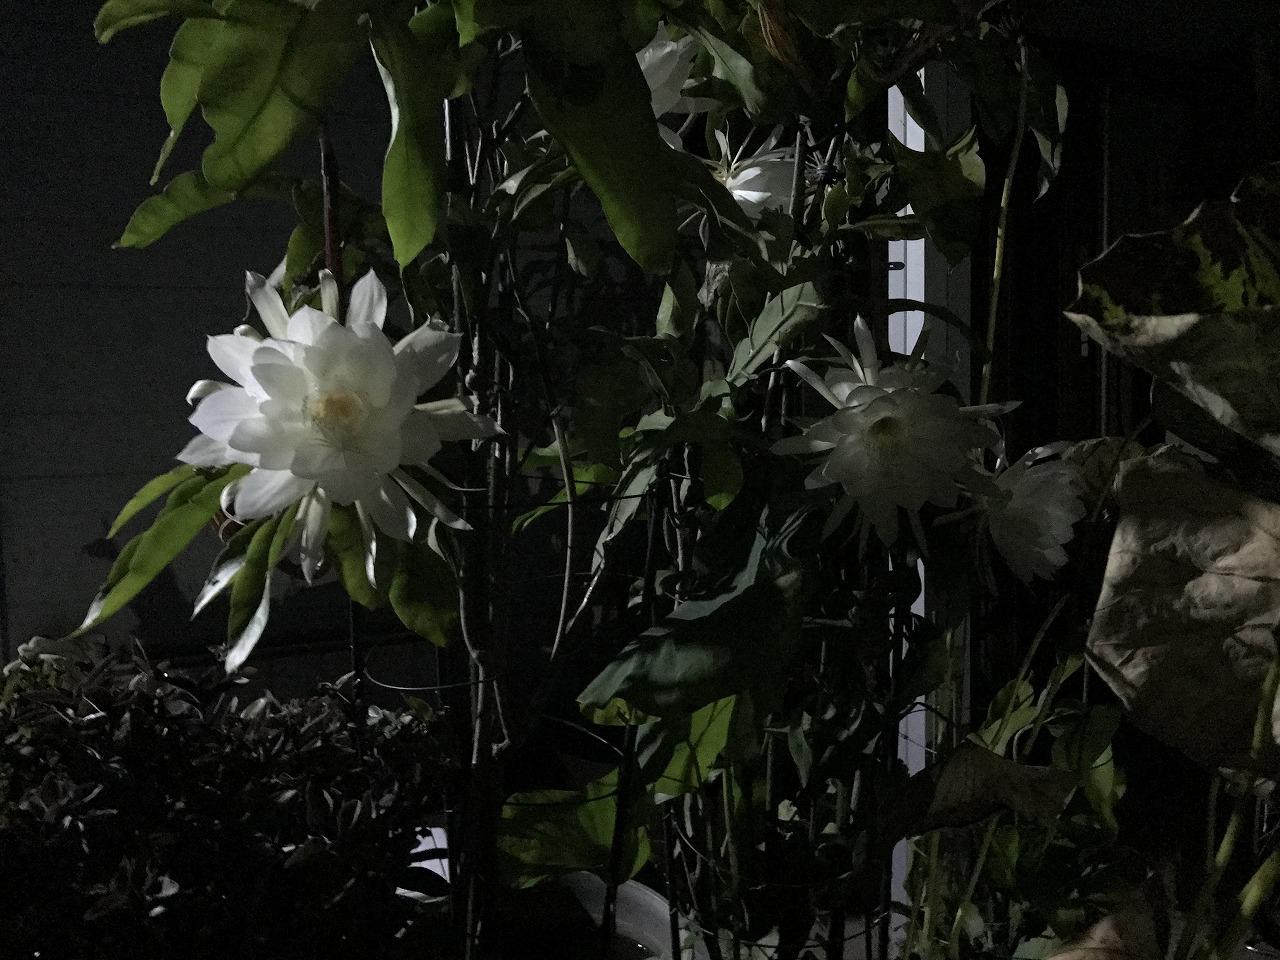 20170910-01-EpiphyllumOxpetalum-I10.jpg